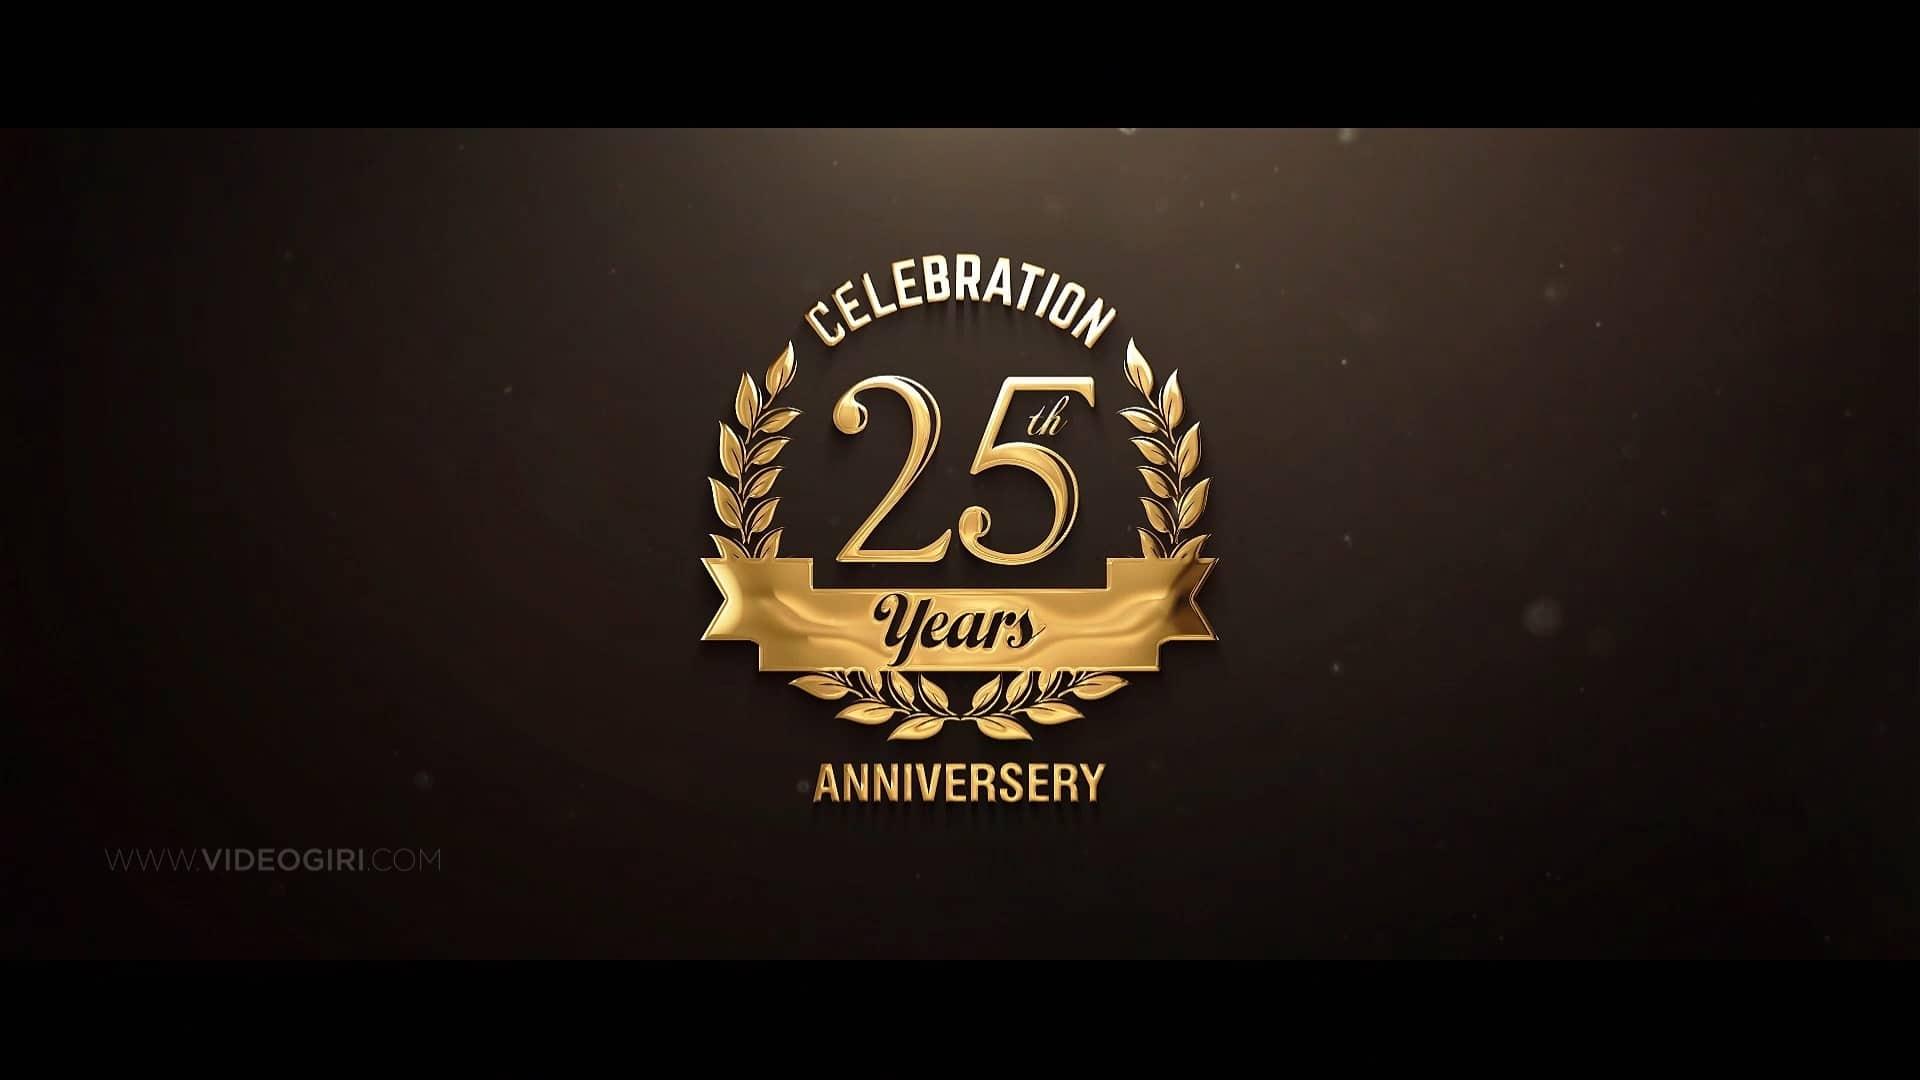 Whatsapp Invitation Video For 25th Wedding Anniversary